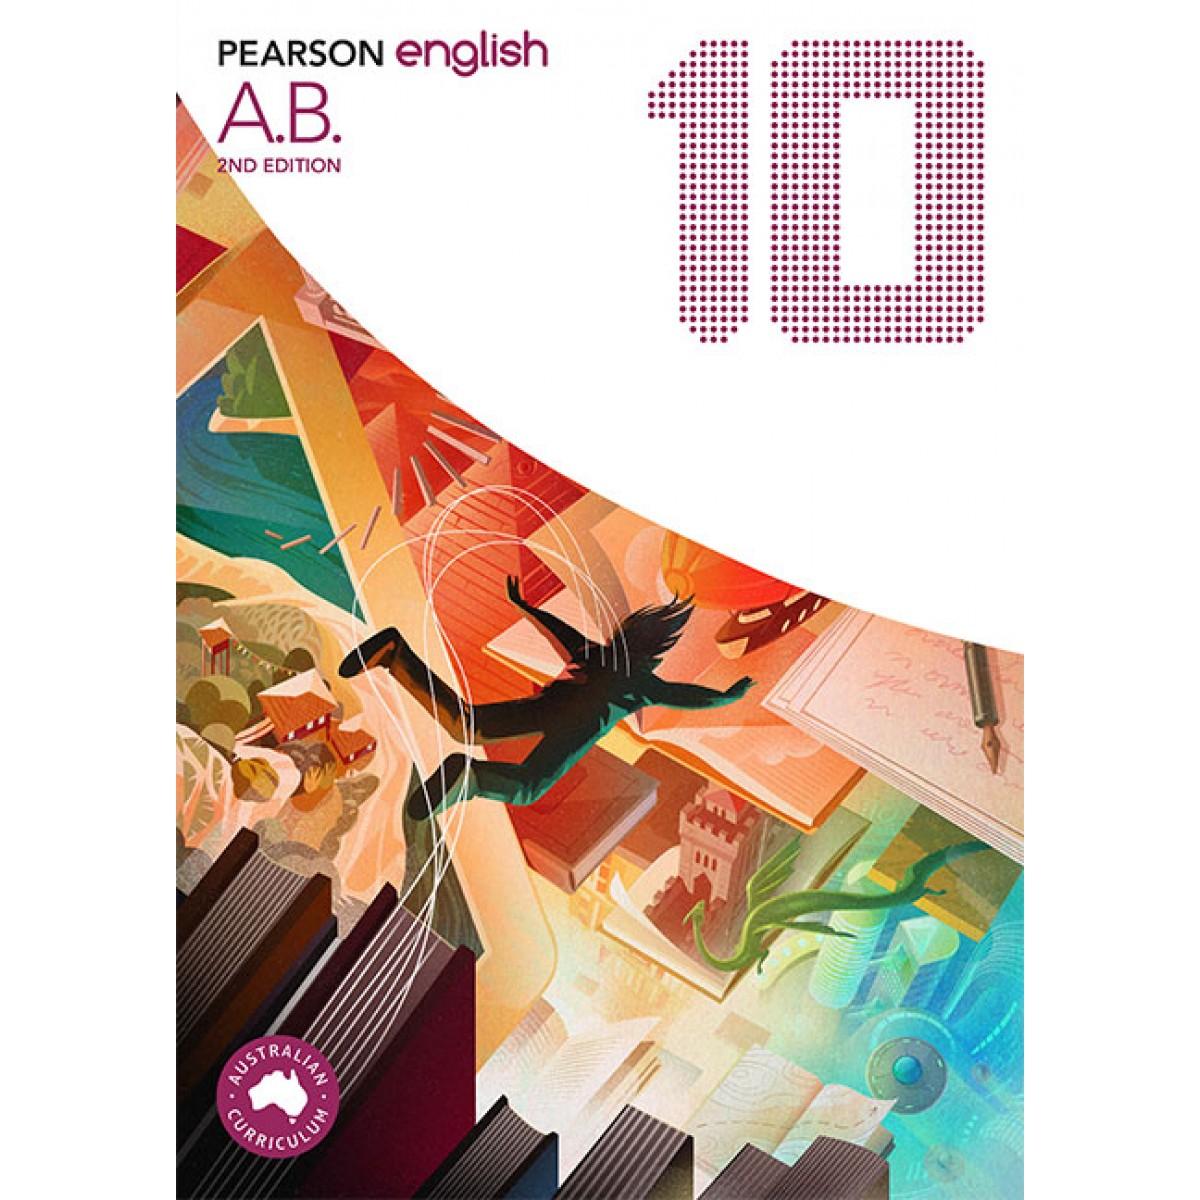 Pearson English Year 10 Activity Book 2nd Ed - The School Locker